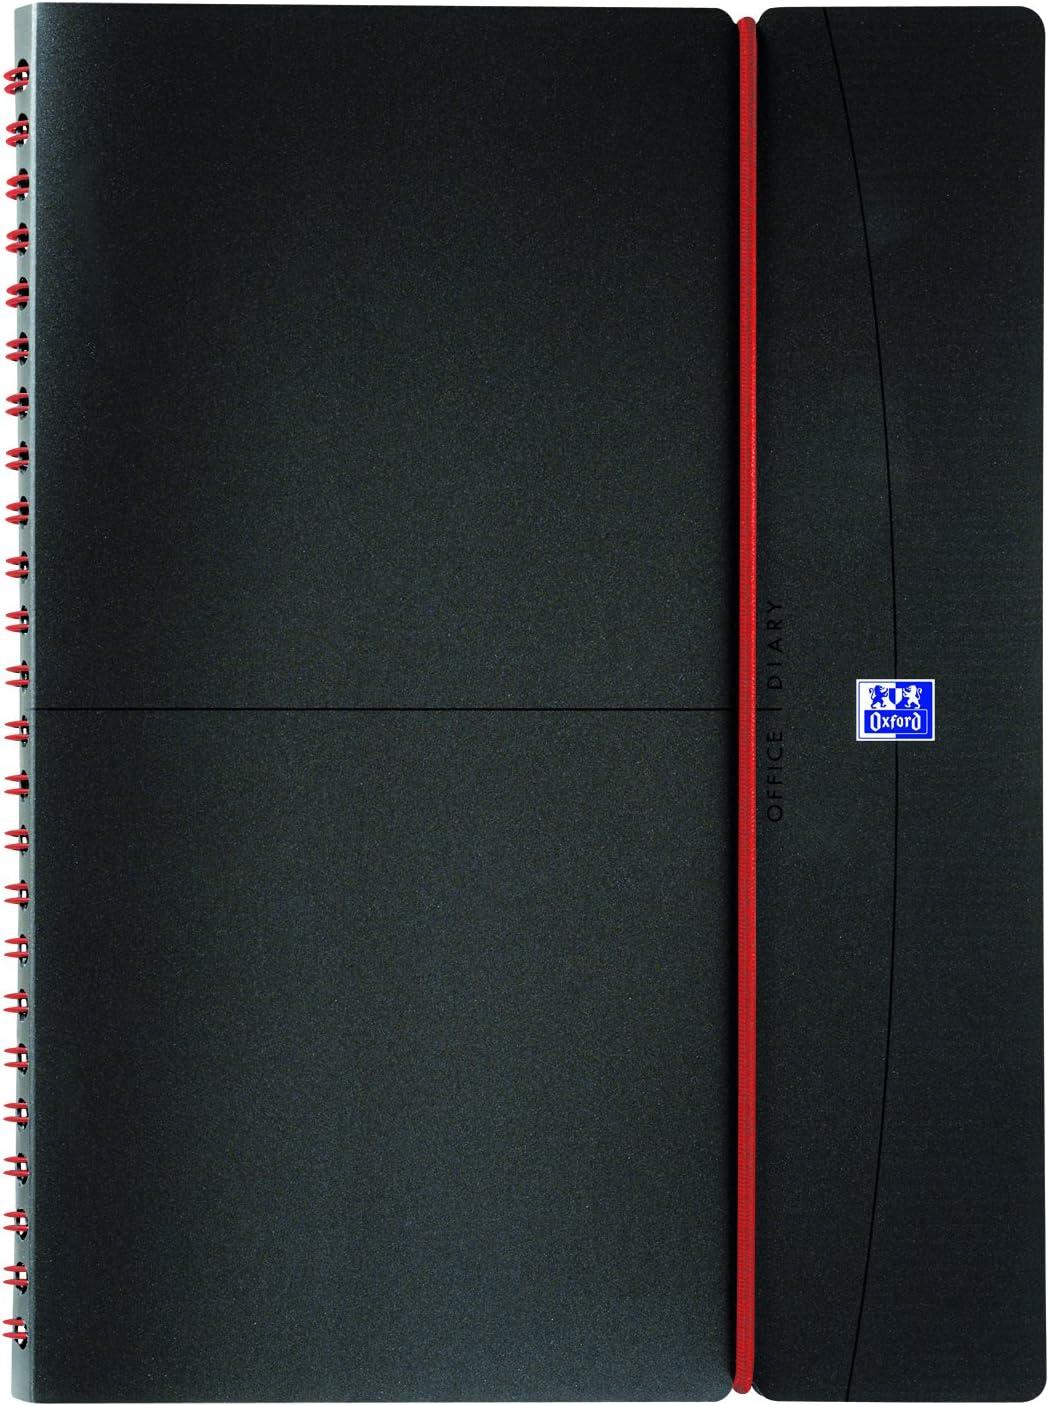 Oxford Lehrerkalender 2020 2021 DIN A4 PP-Deckel schwarz 80 Blatt